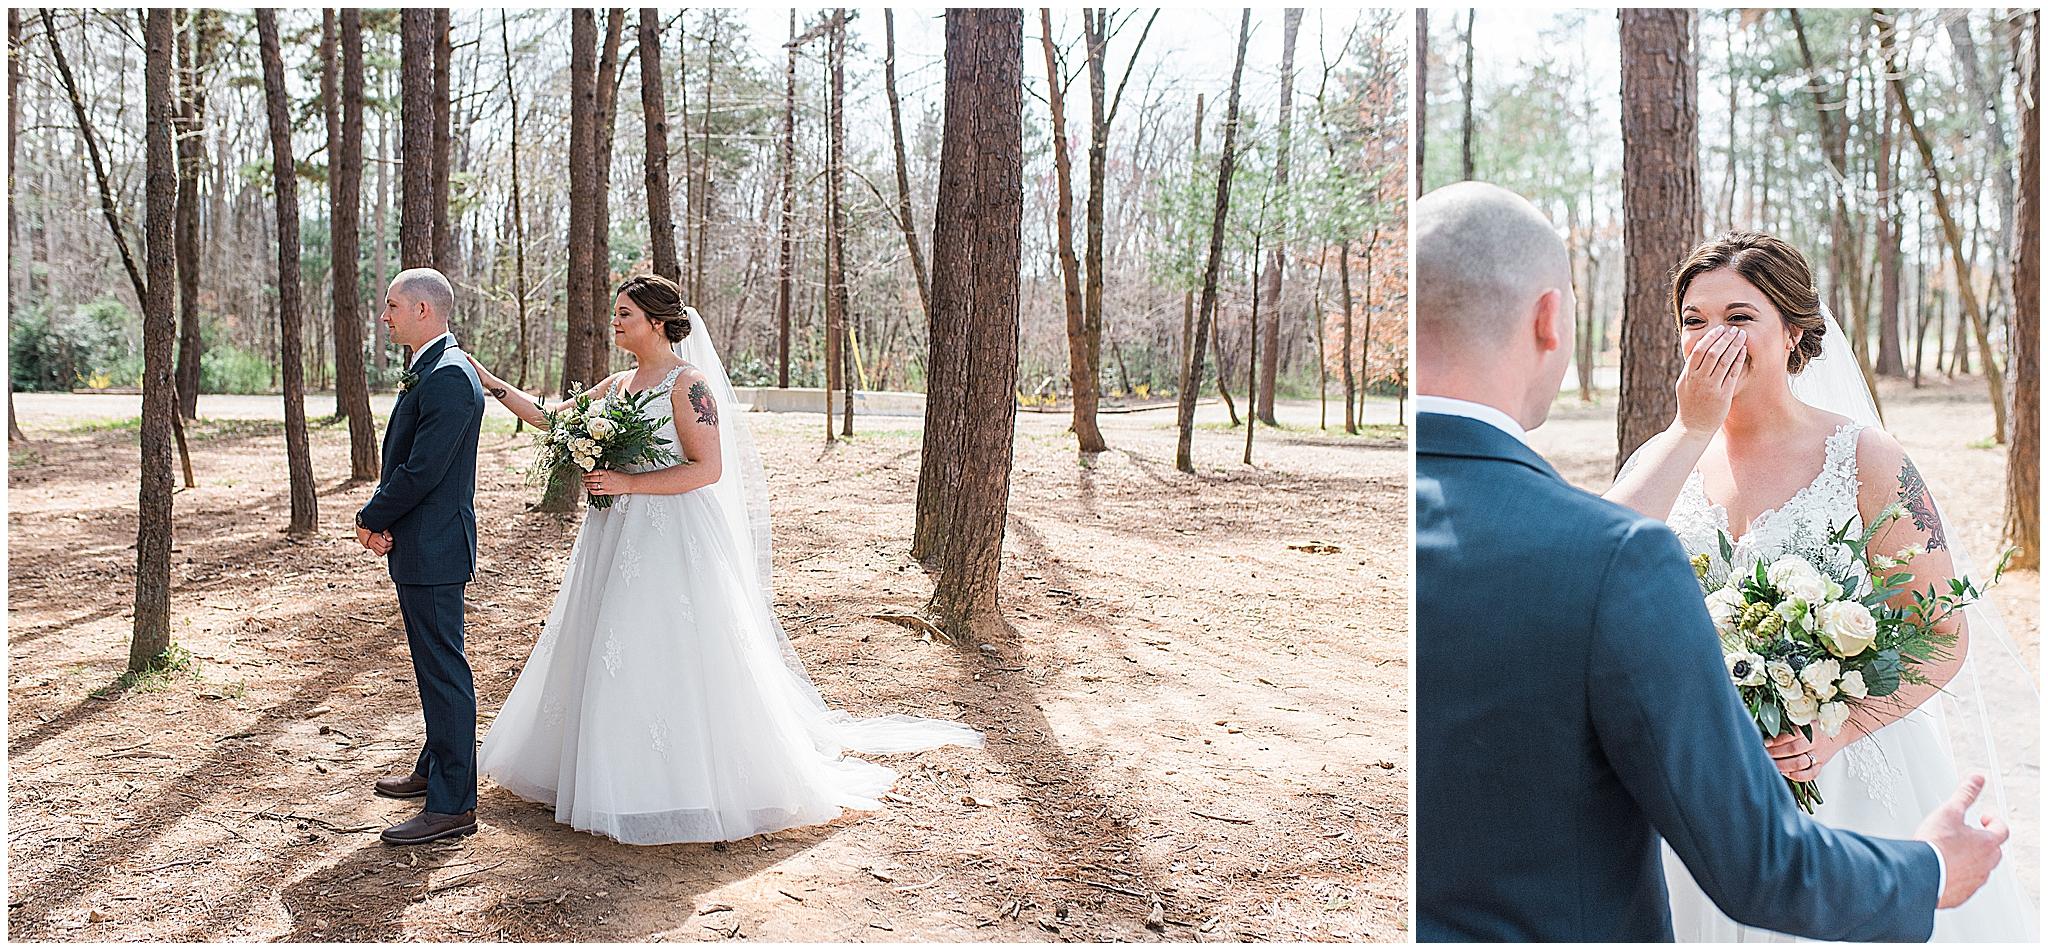 Wedding_Photographer_Asheville_Highland_Brewing_0008.jpg